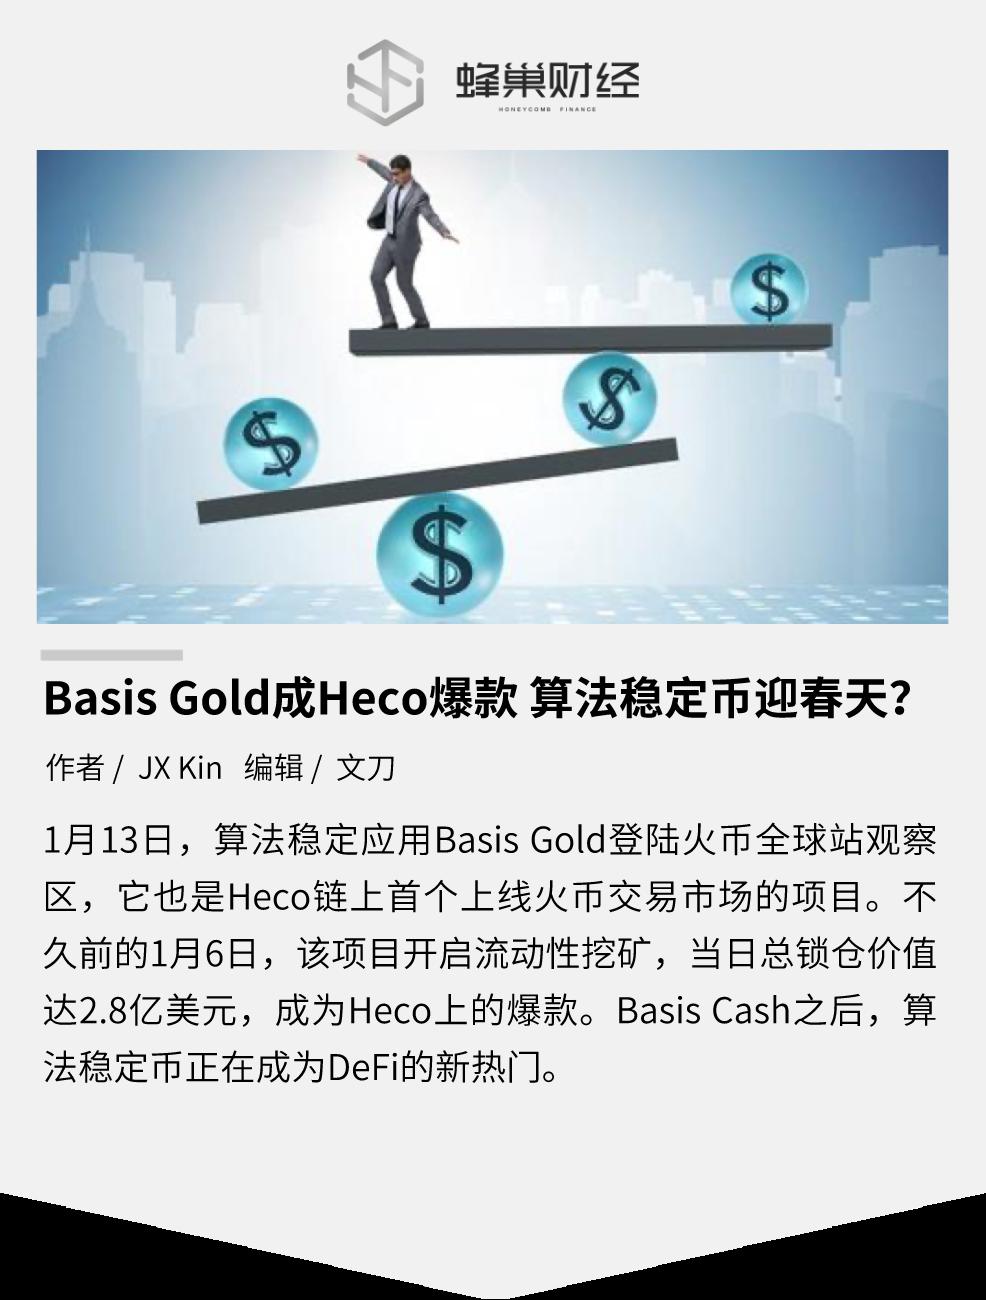 Basis Gold成Heco爆款,算法稳定币迎春天?